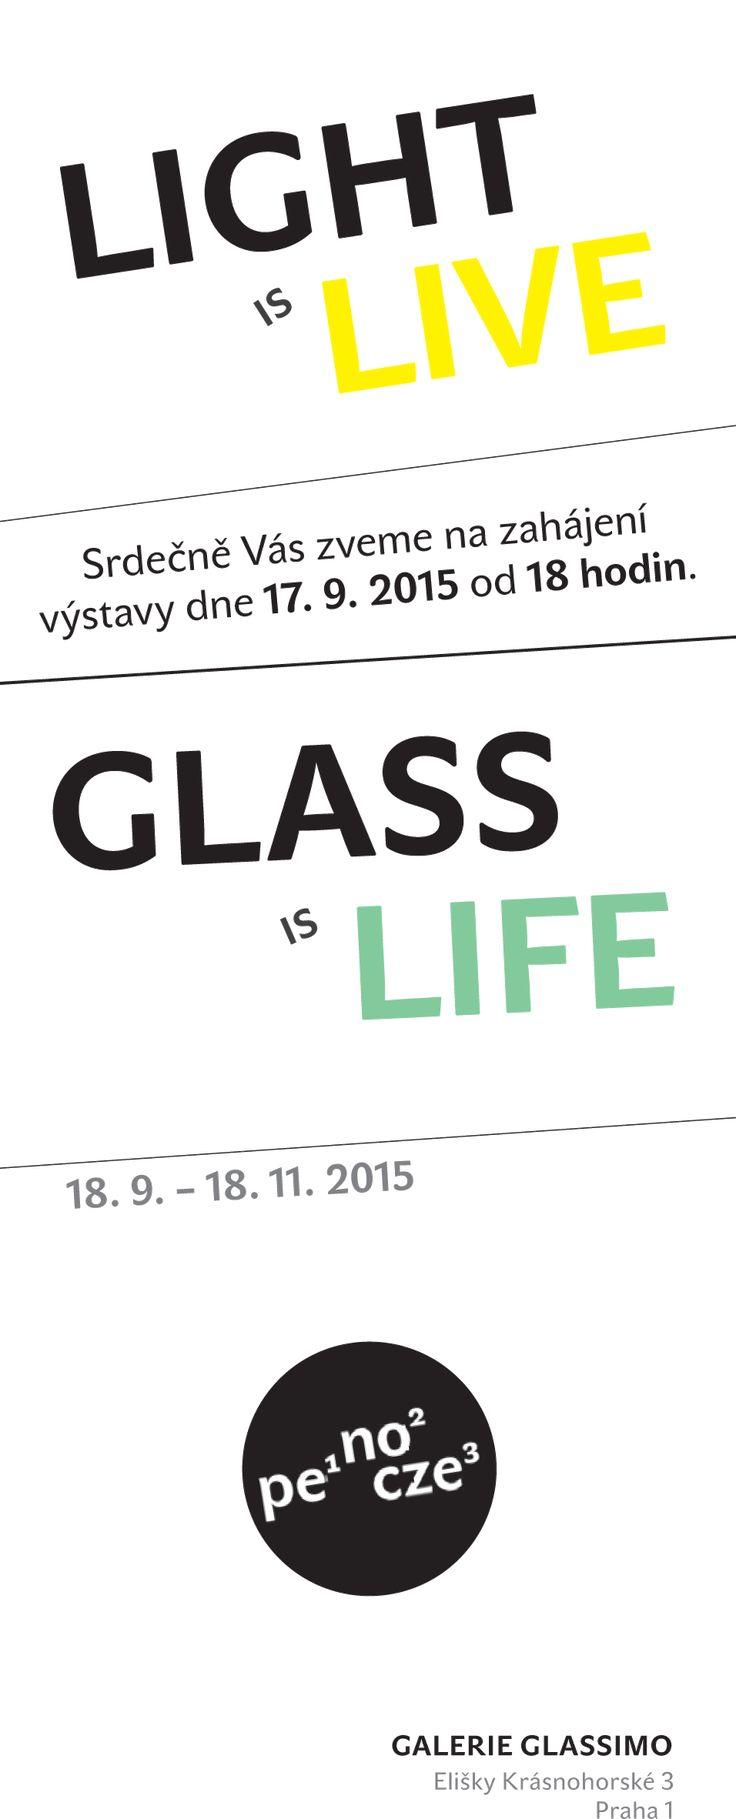 LIGHT IS LIVE, GLASS IS LIFE - www.glassimo.eu